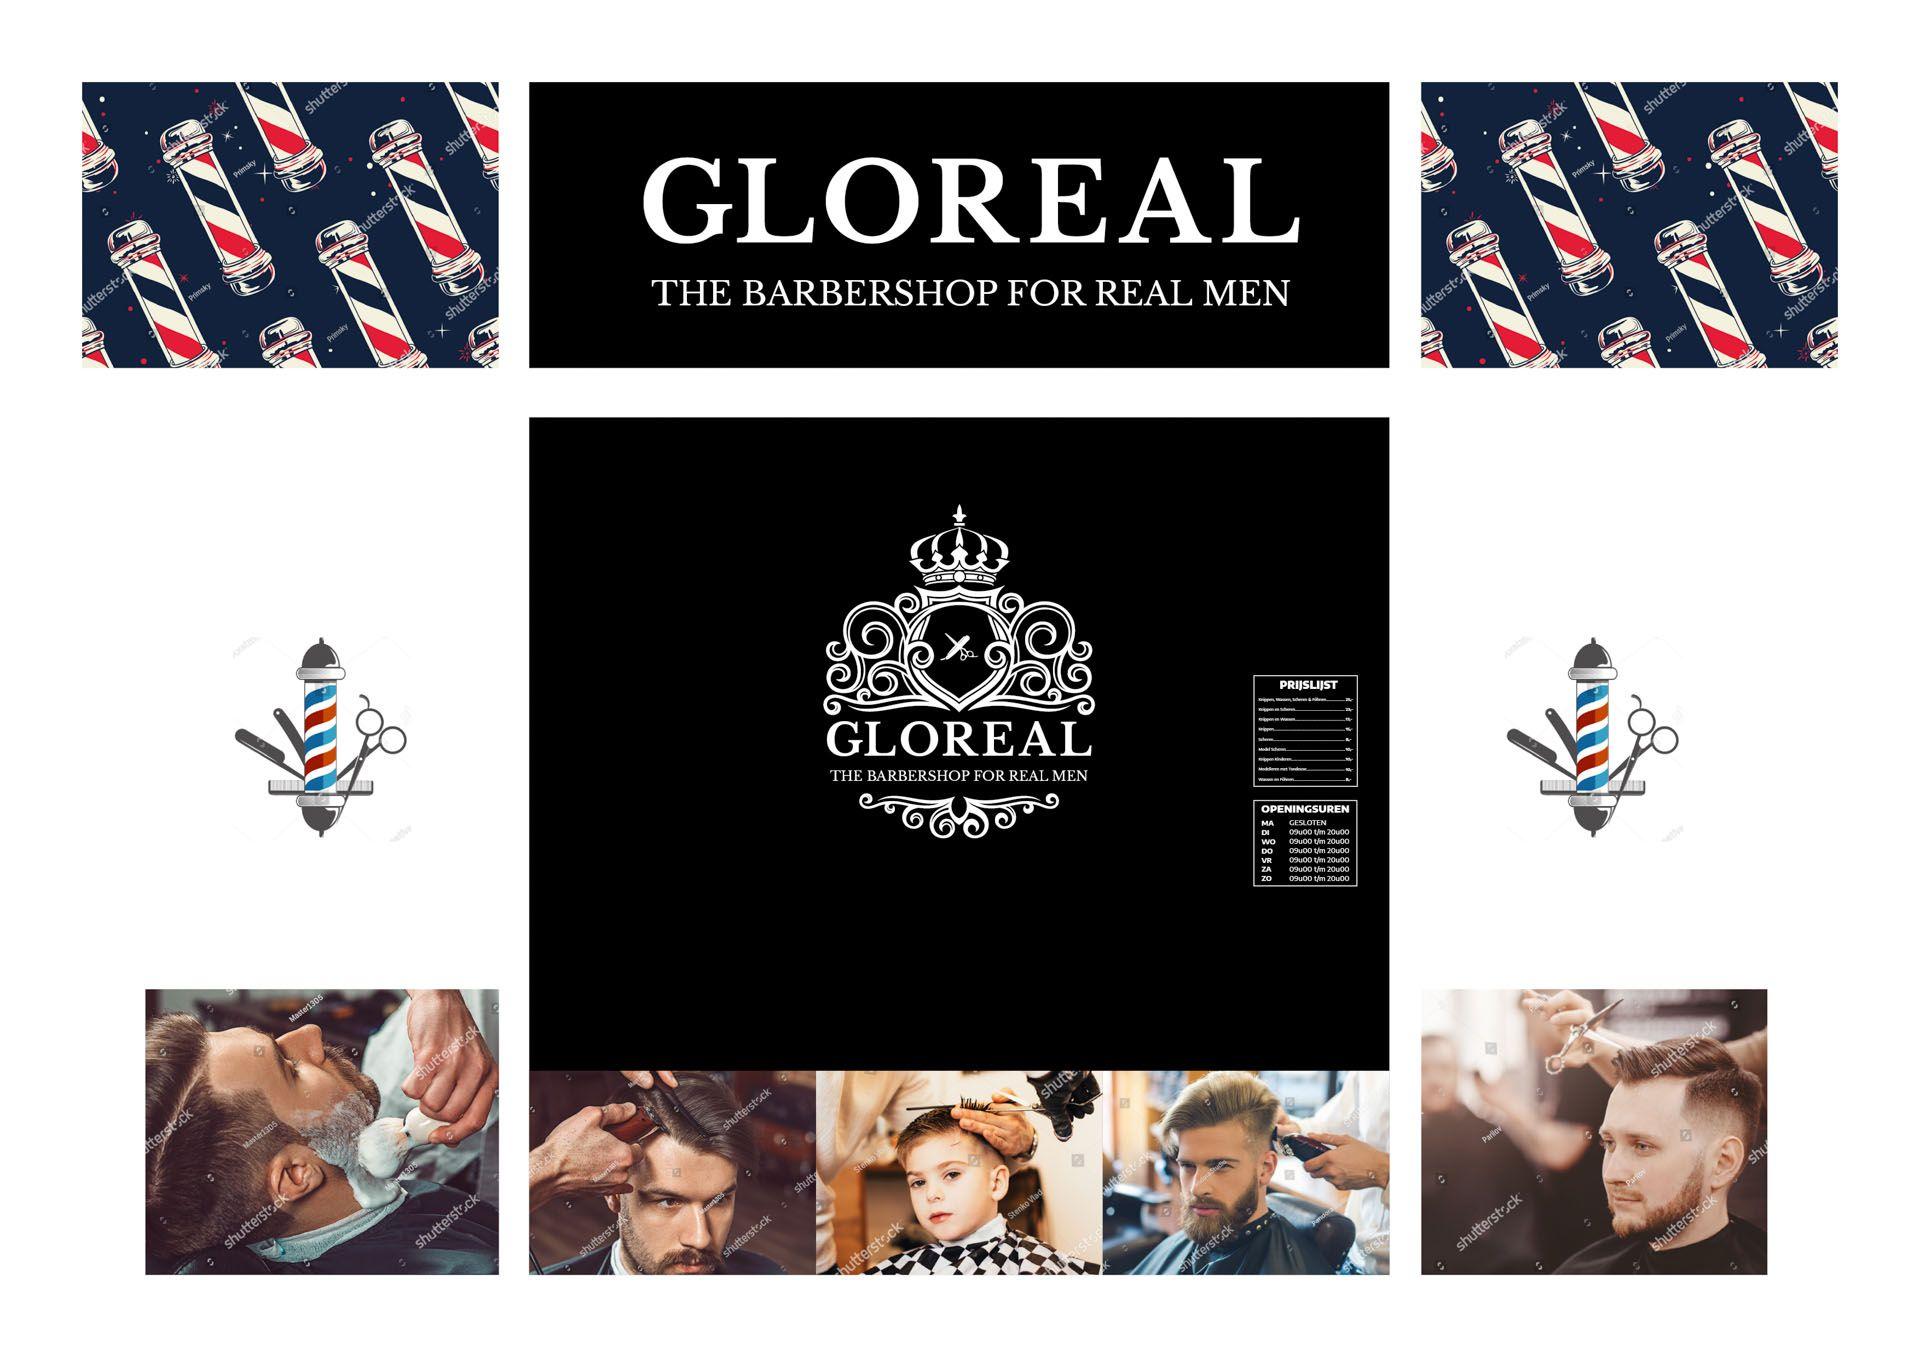 Barbershop Gloreal